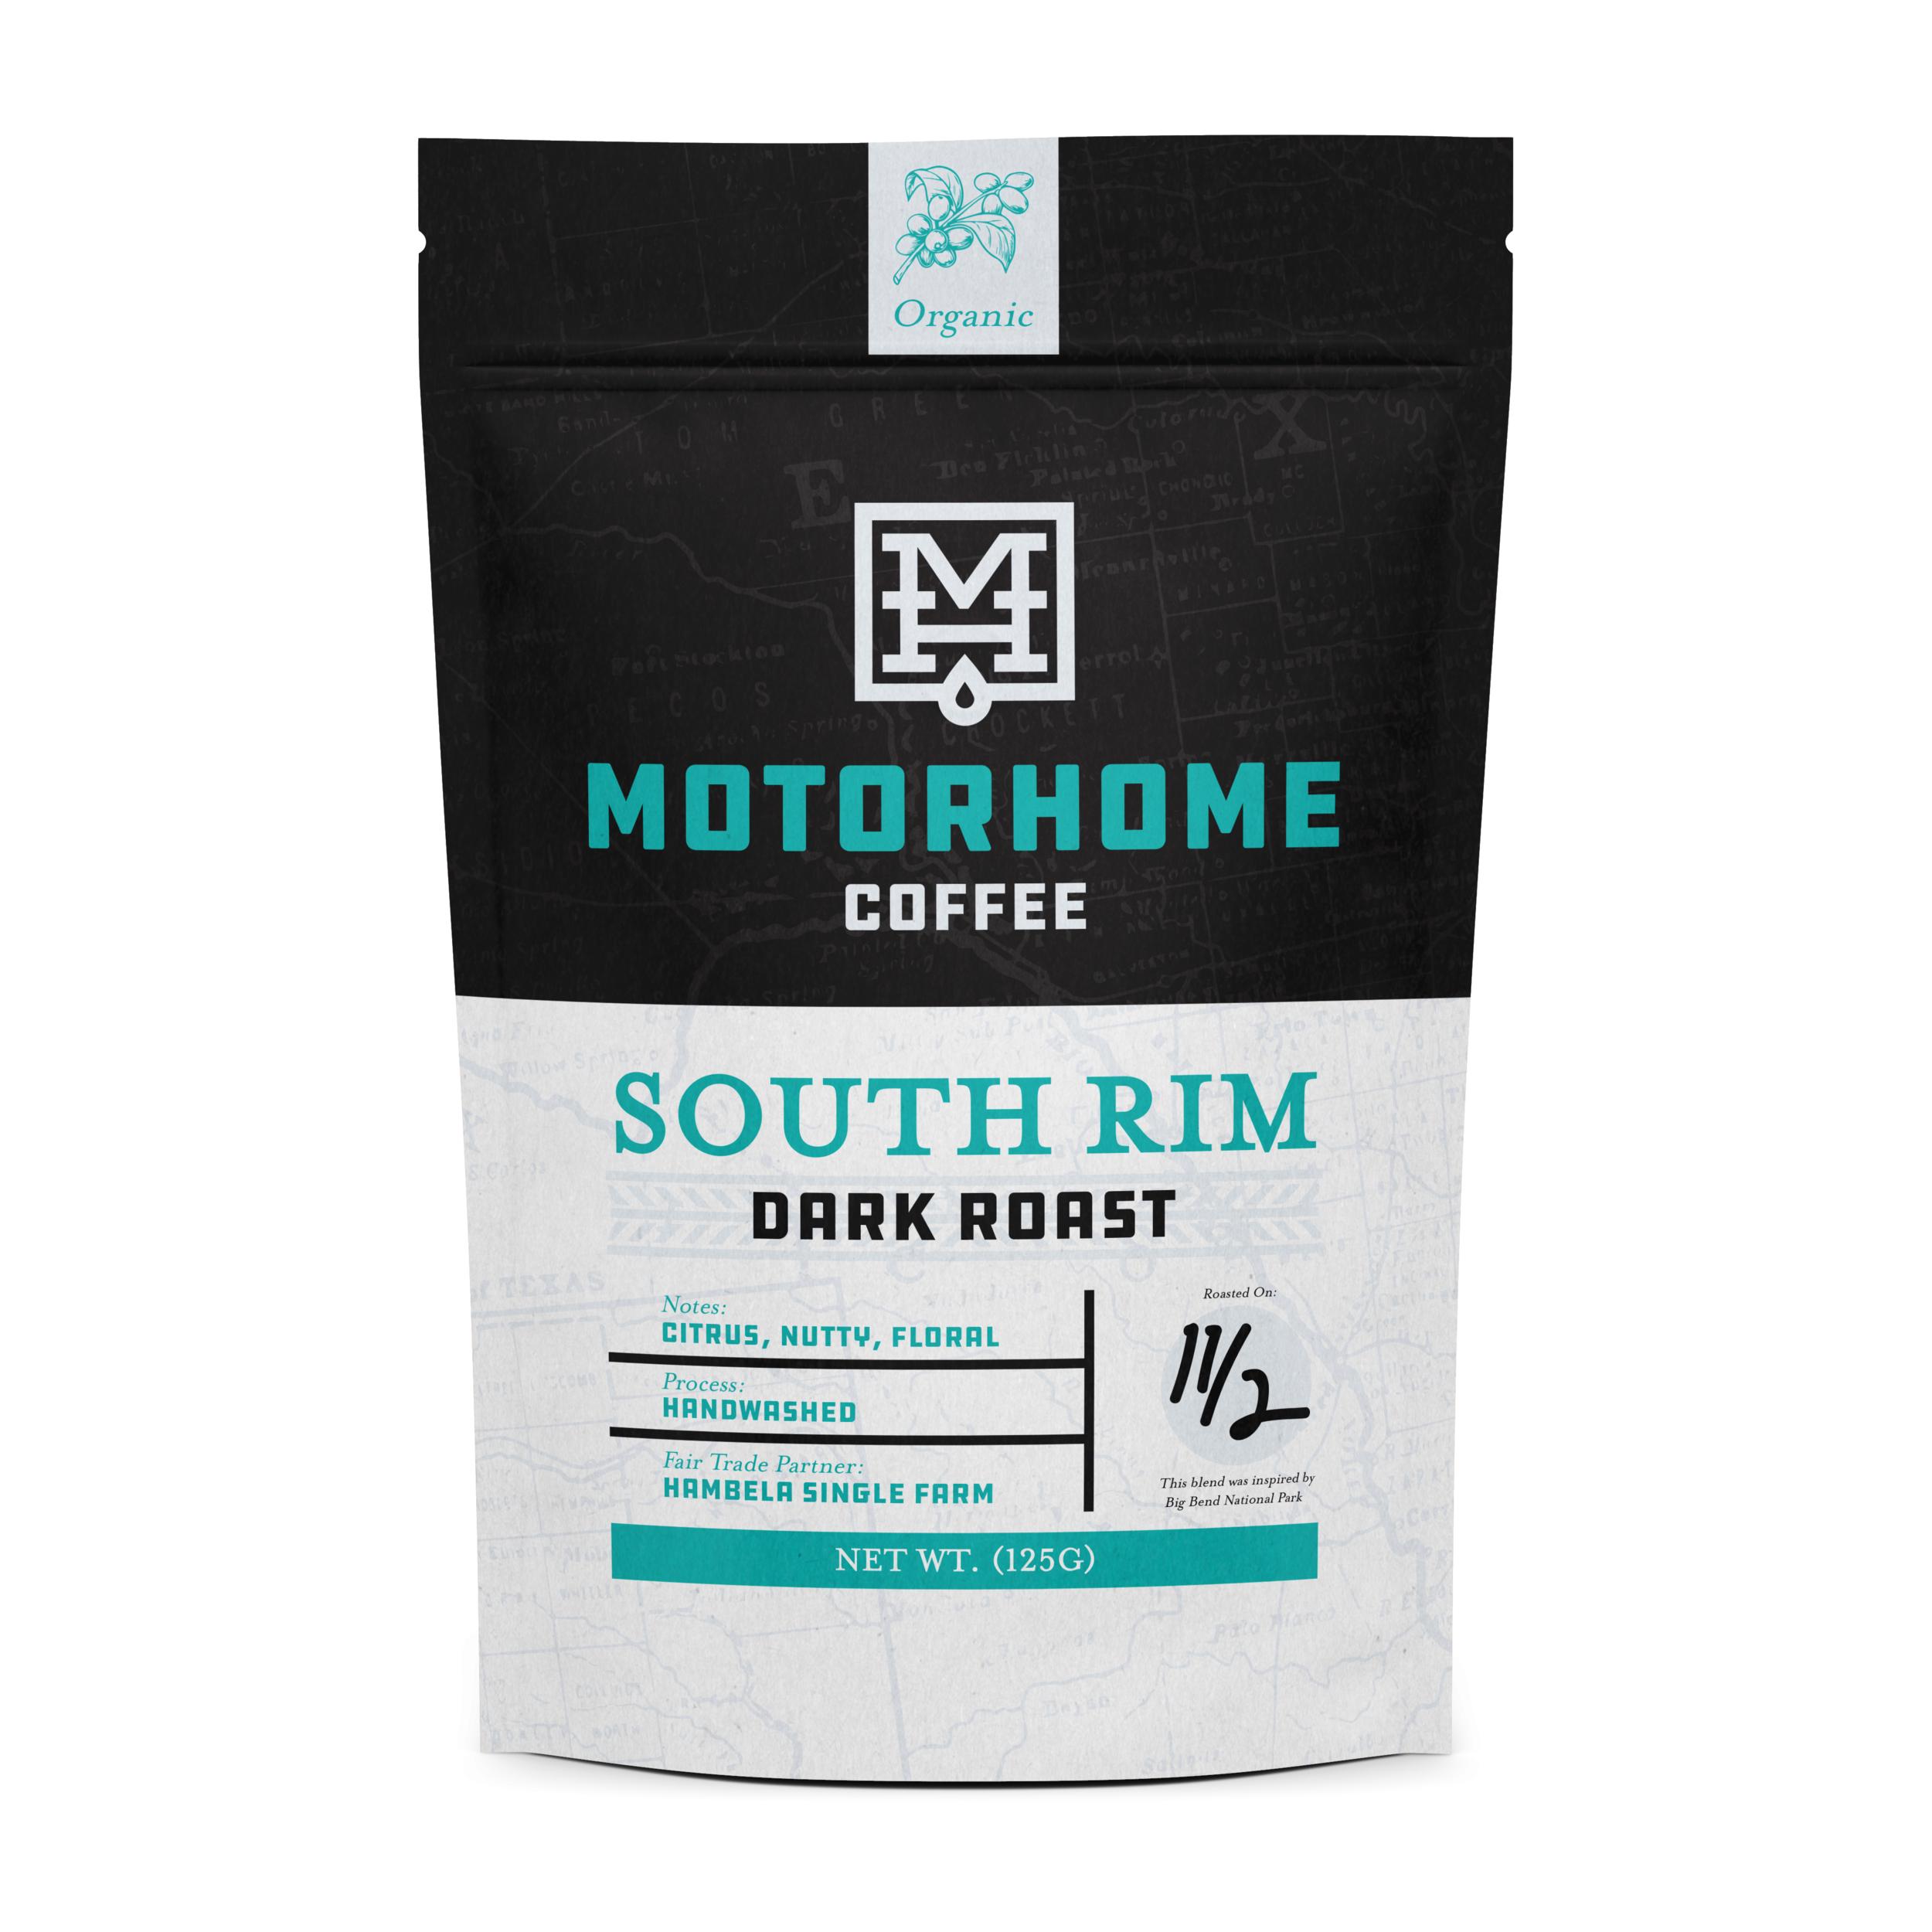 Motorhome Coffee Mockup - South Rim.png